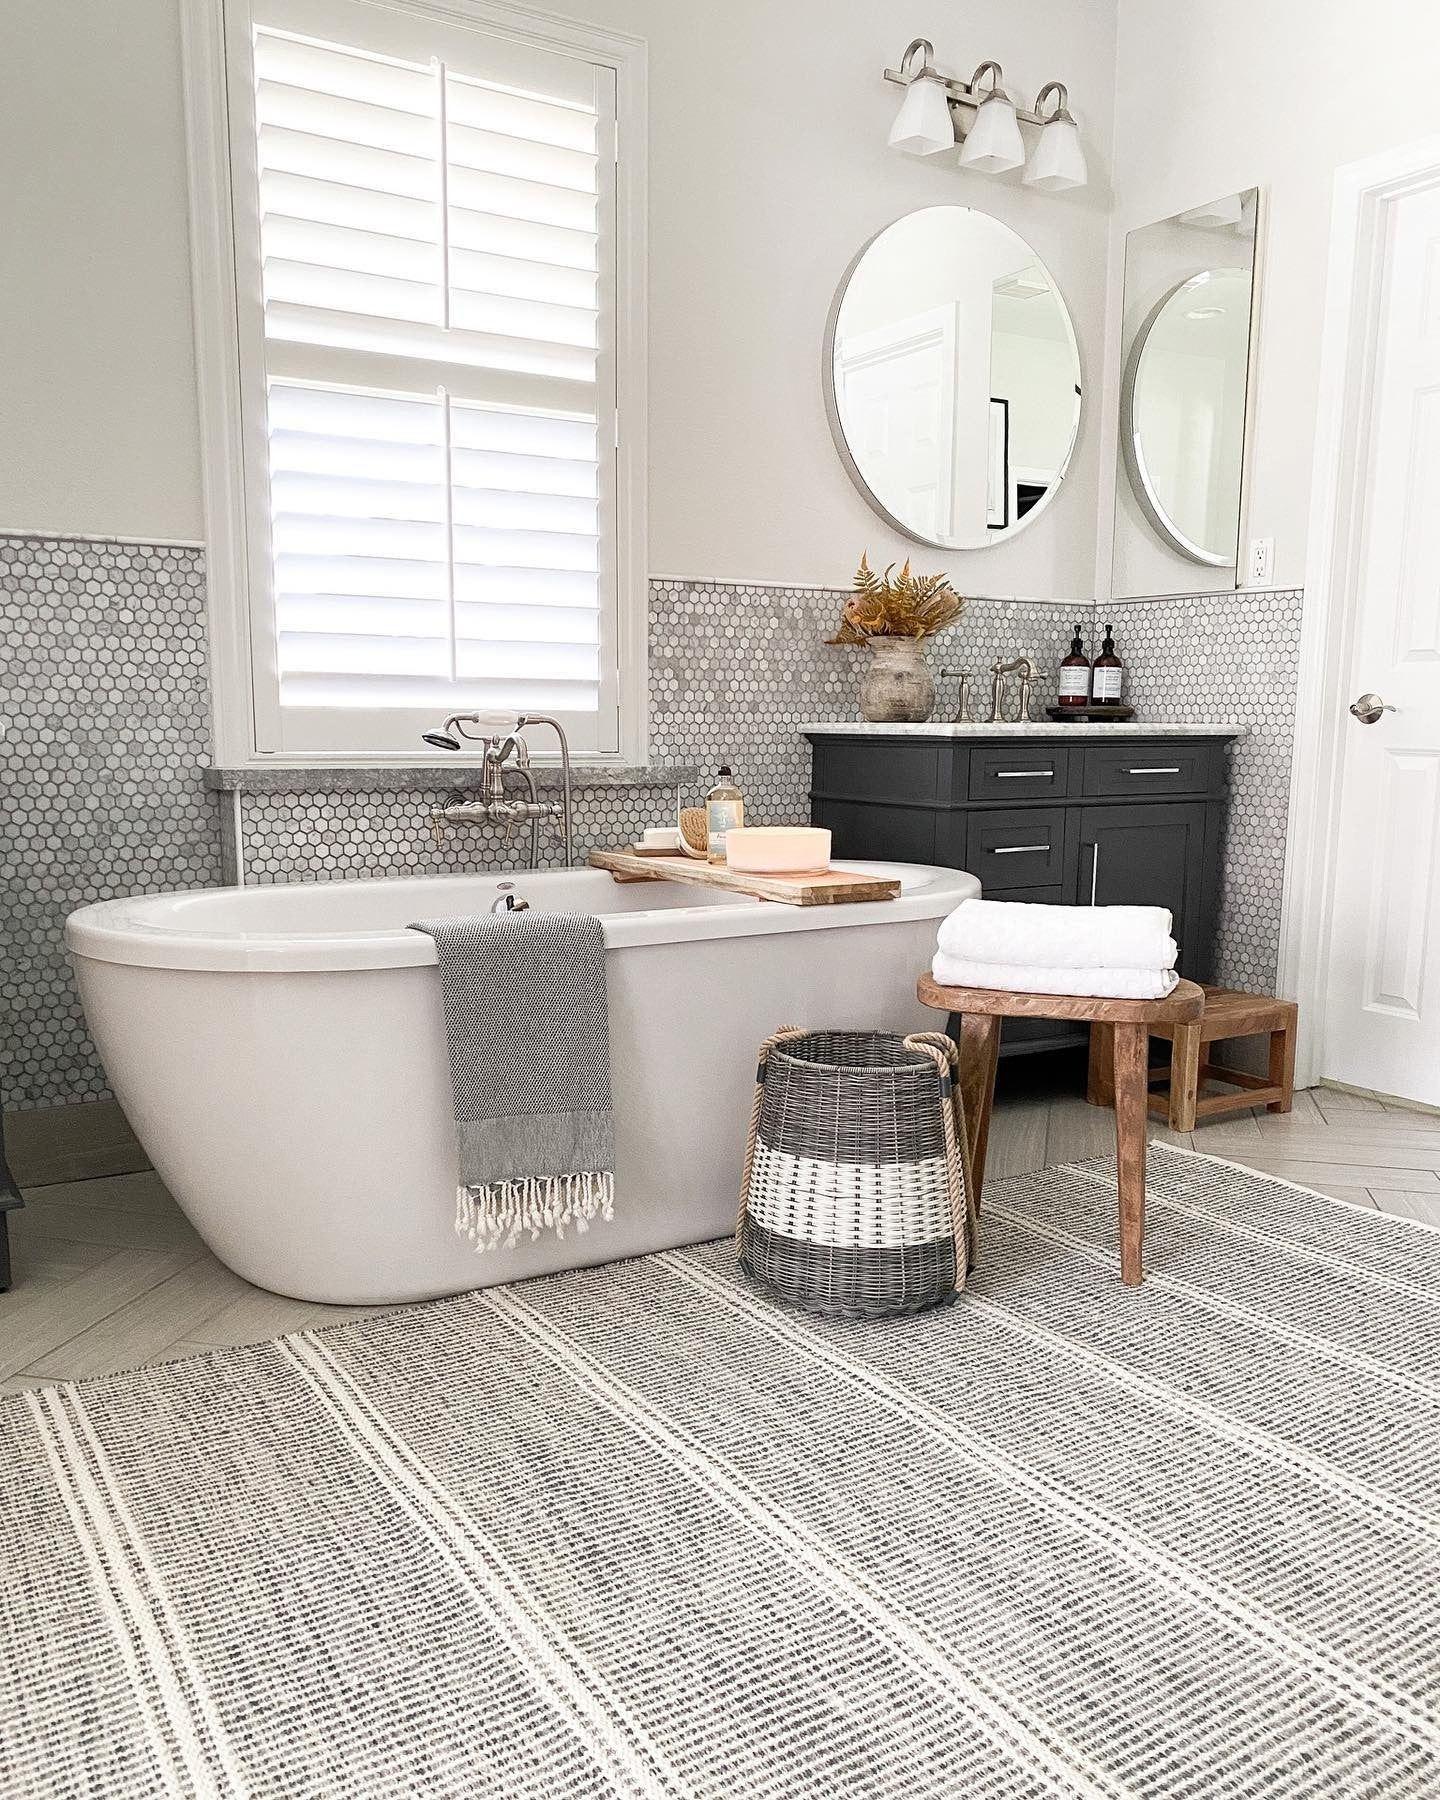 Malta Grey Woven Wool Rug Dash Albert In 2020 Home Annie Selke White Rooms